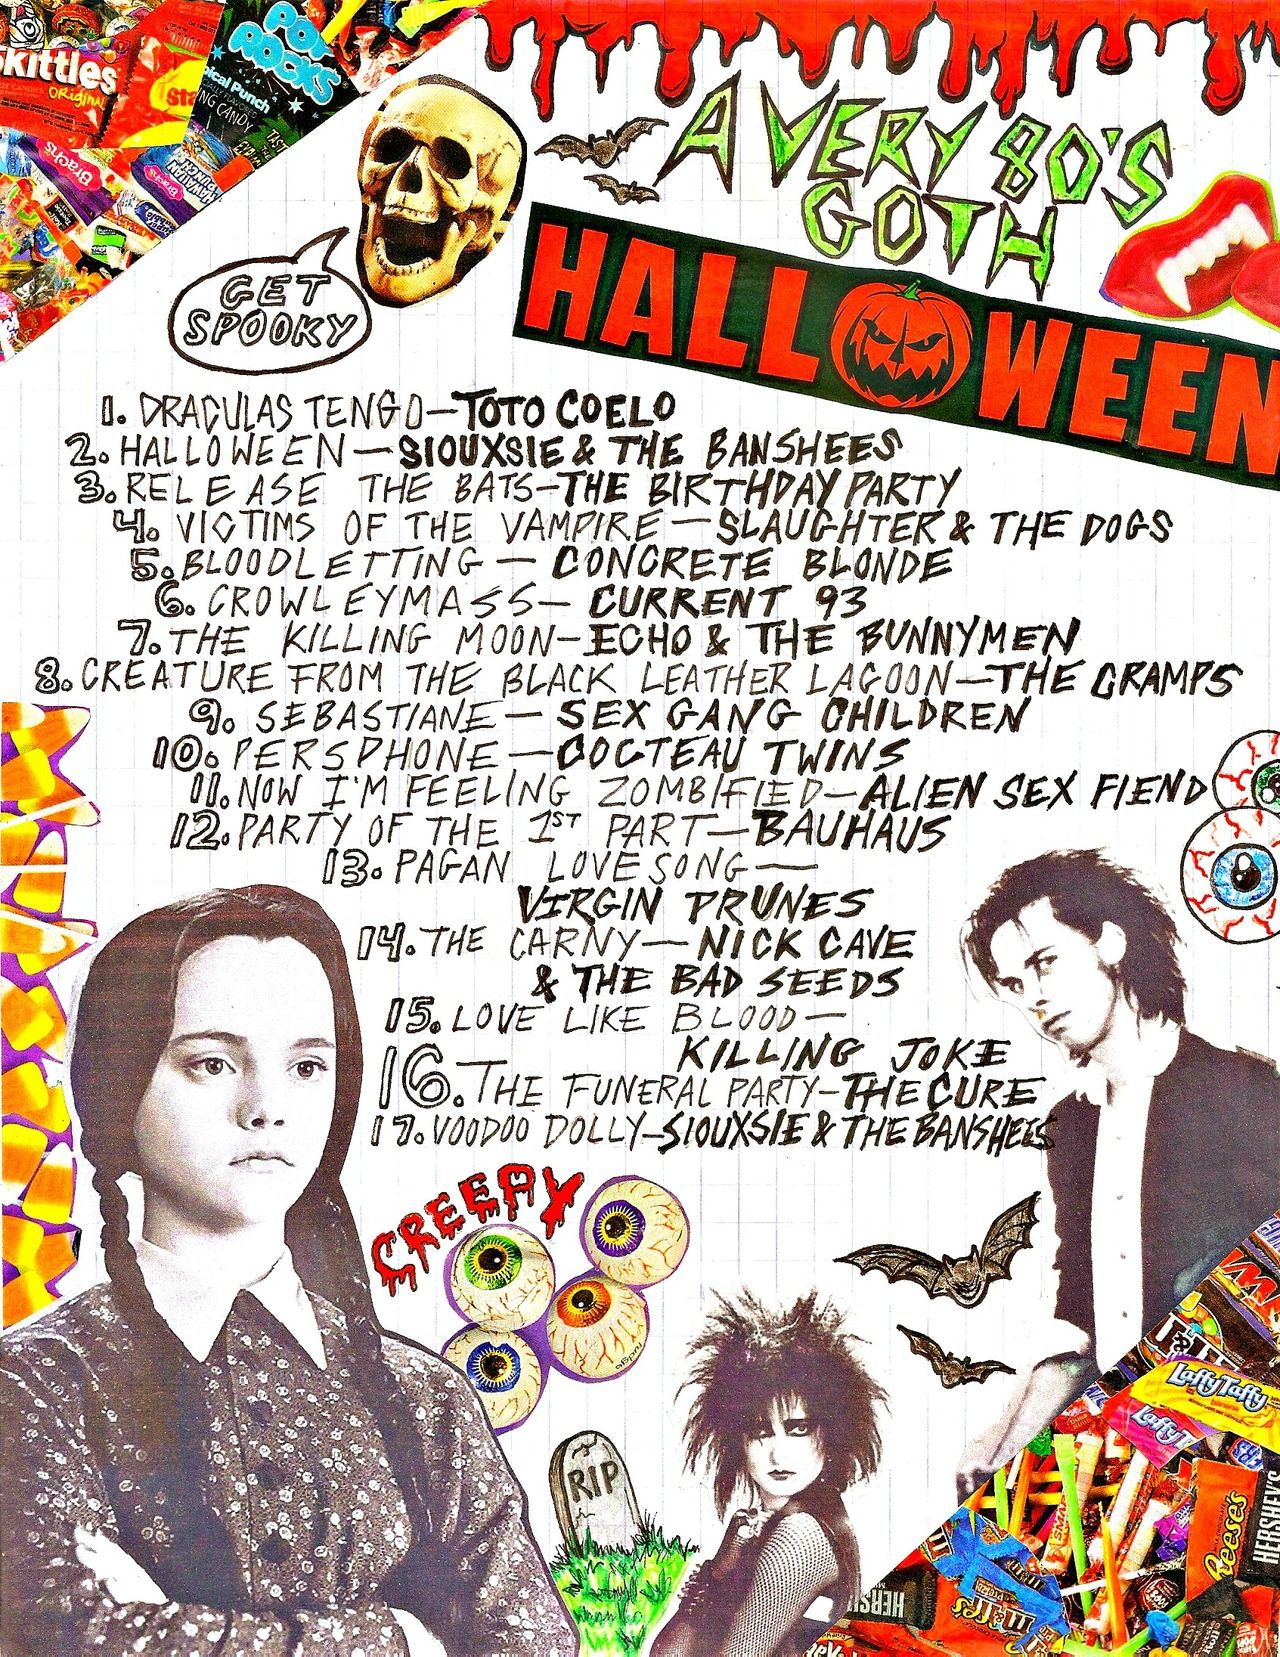 80s goth halloween mixtape !! listen to it on 8tracks here